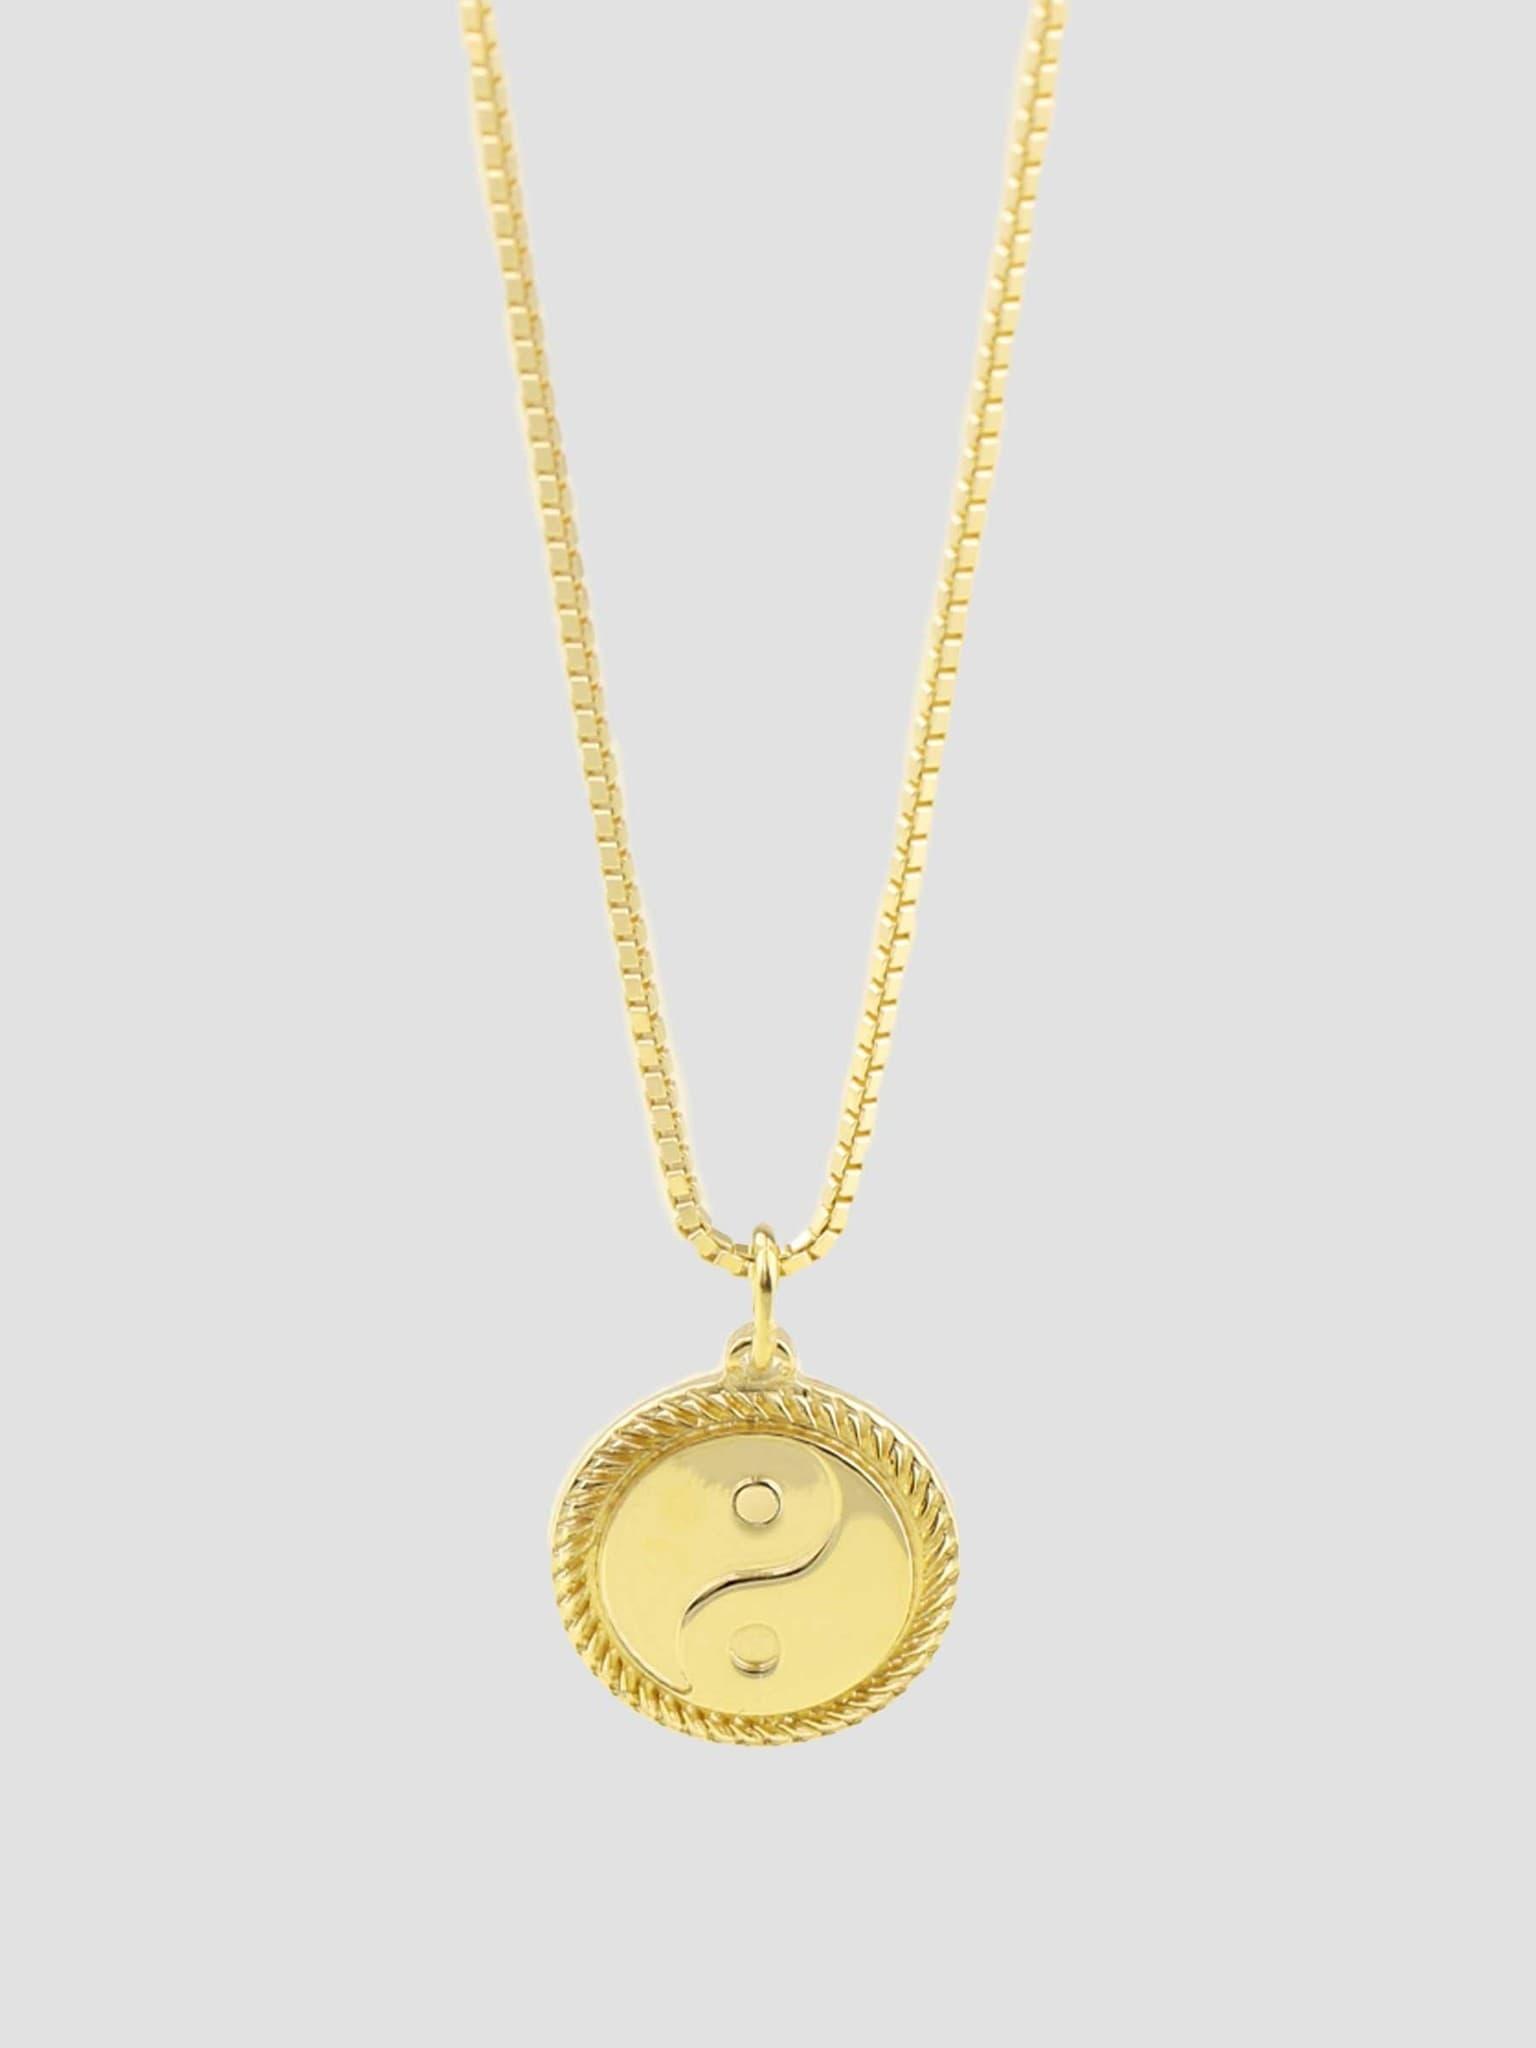 Yin Yang Necklace Gold